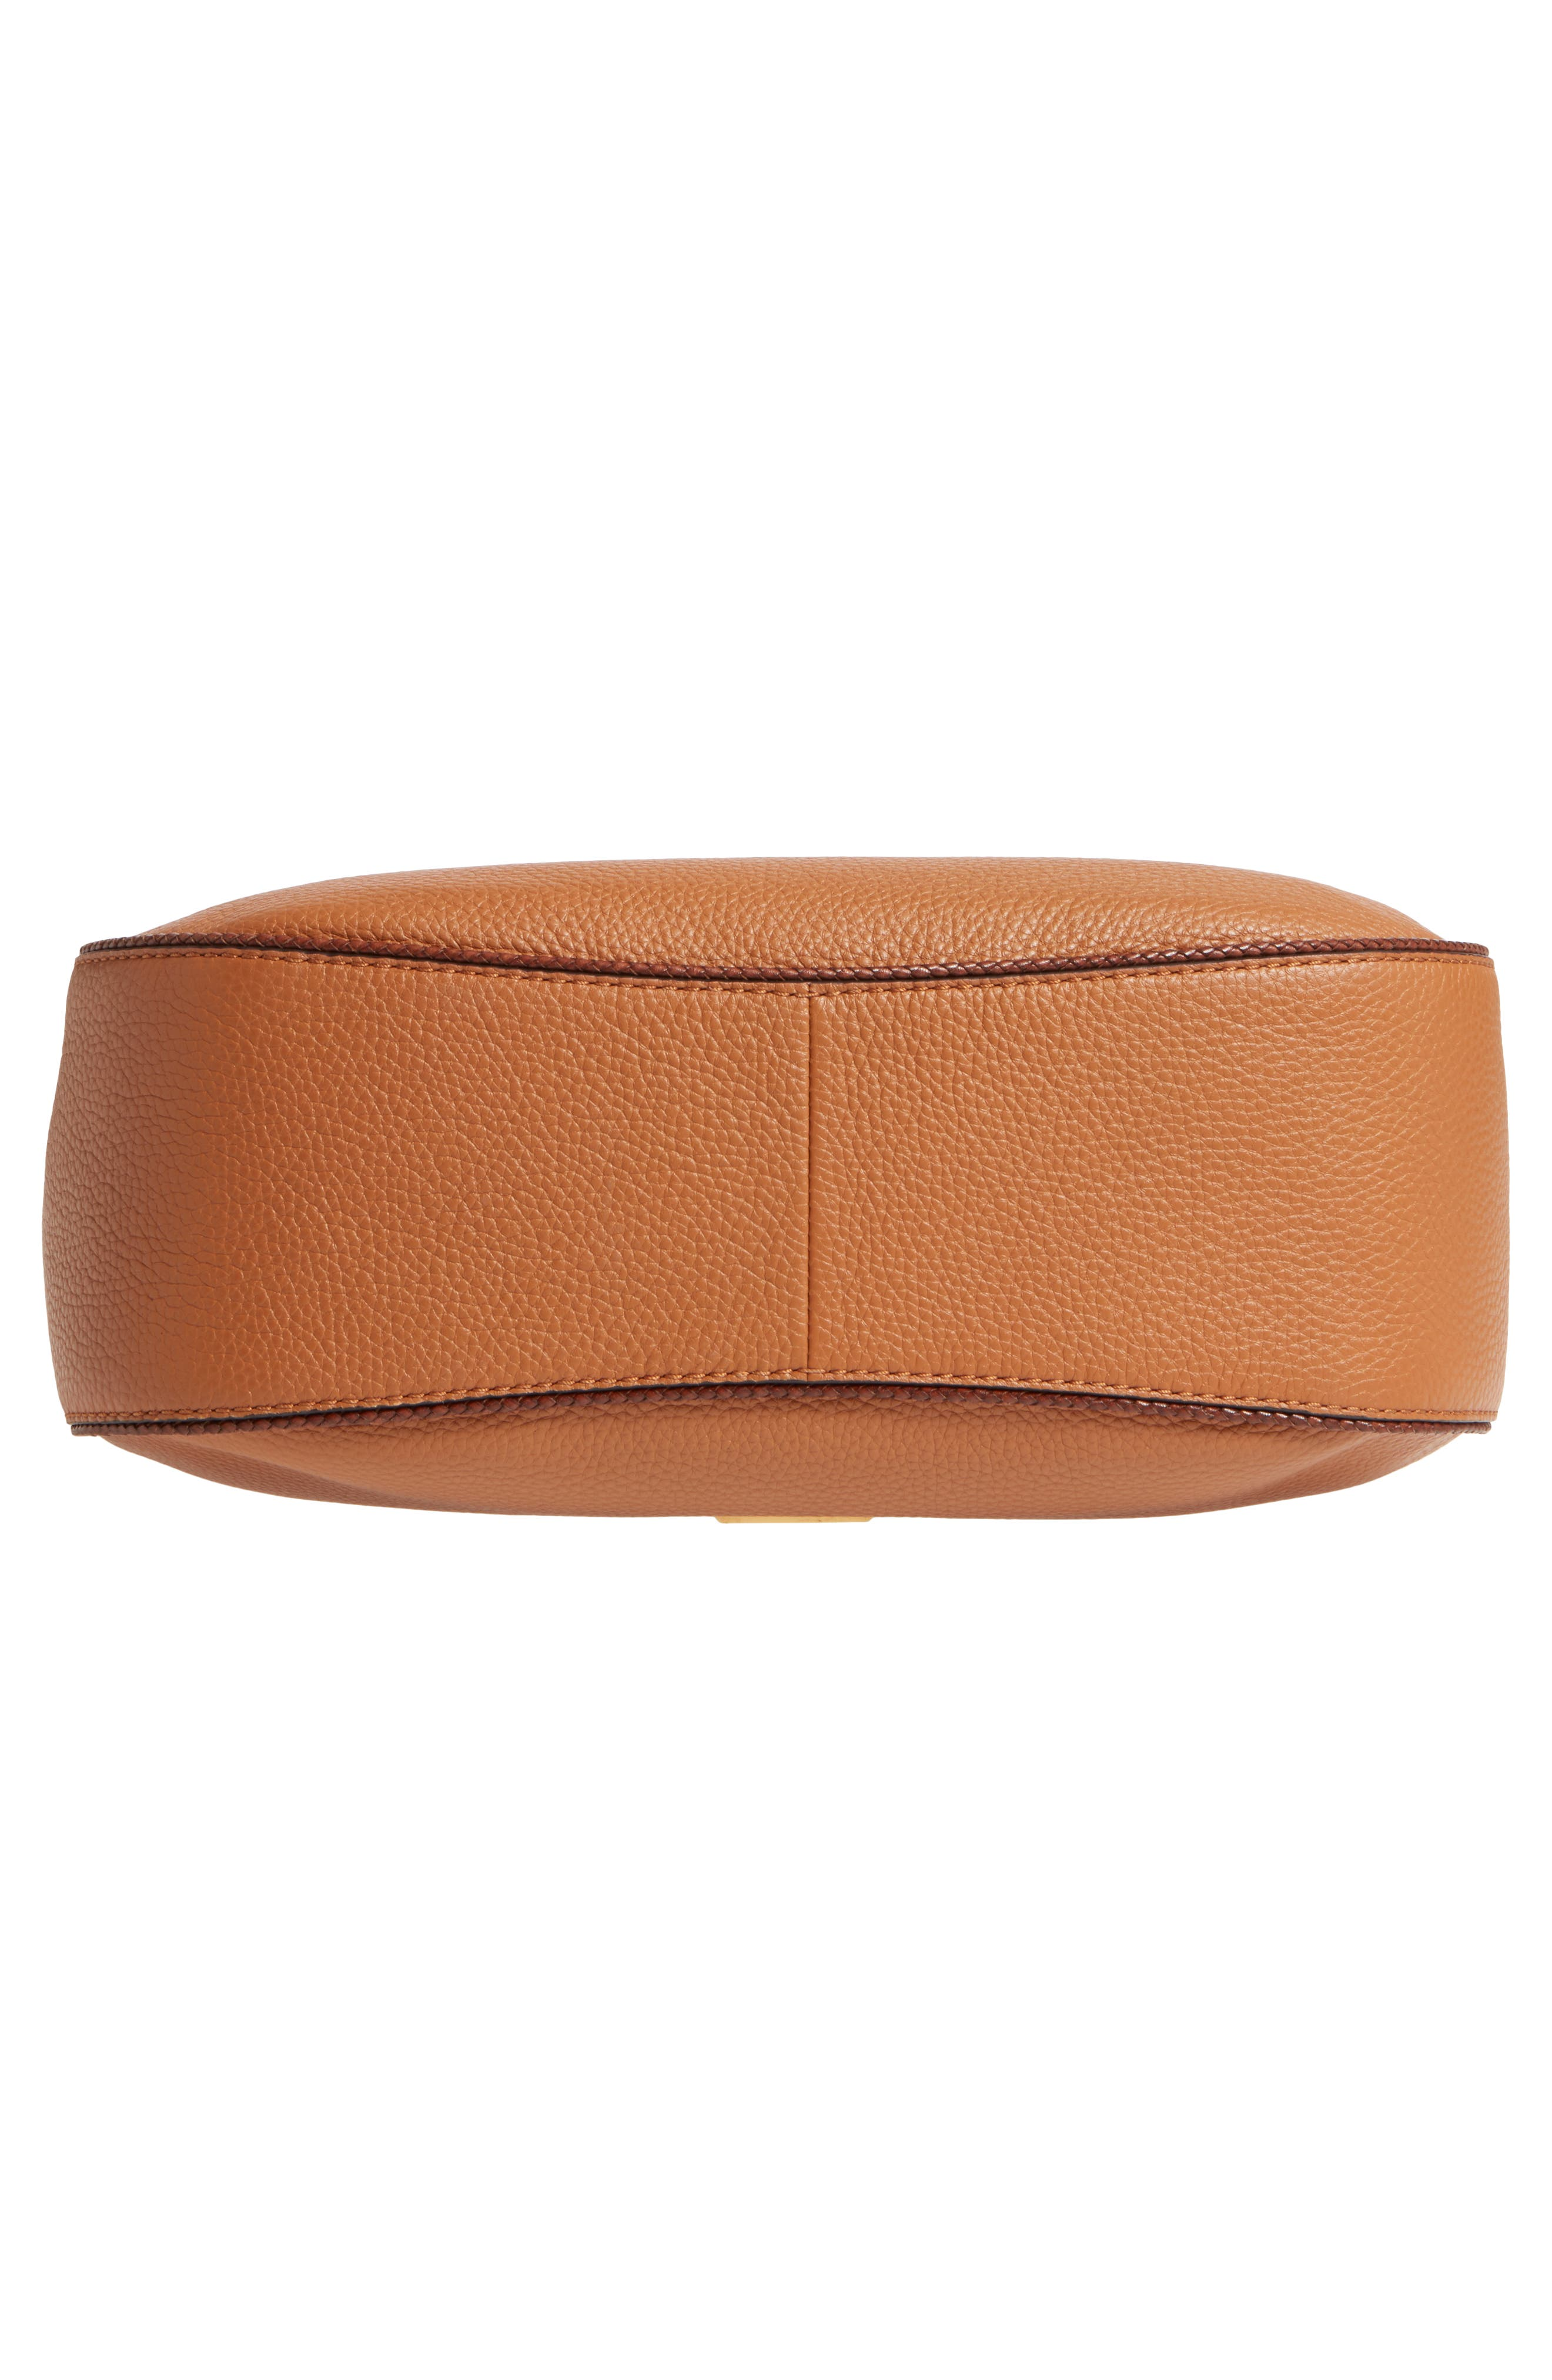 Skorpios Leather Hobo,                             Alternate thumbnail 5, color,                             Acorn